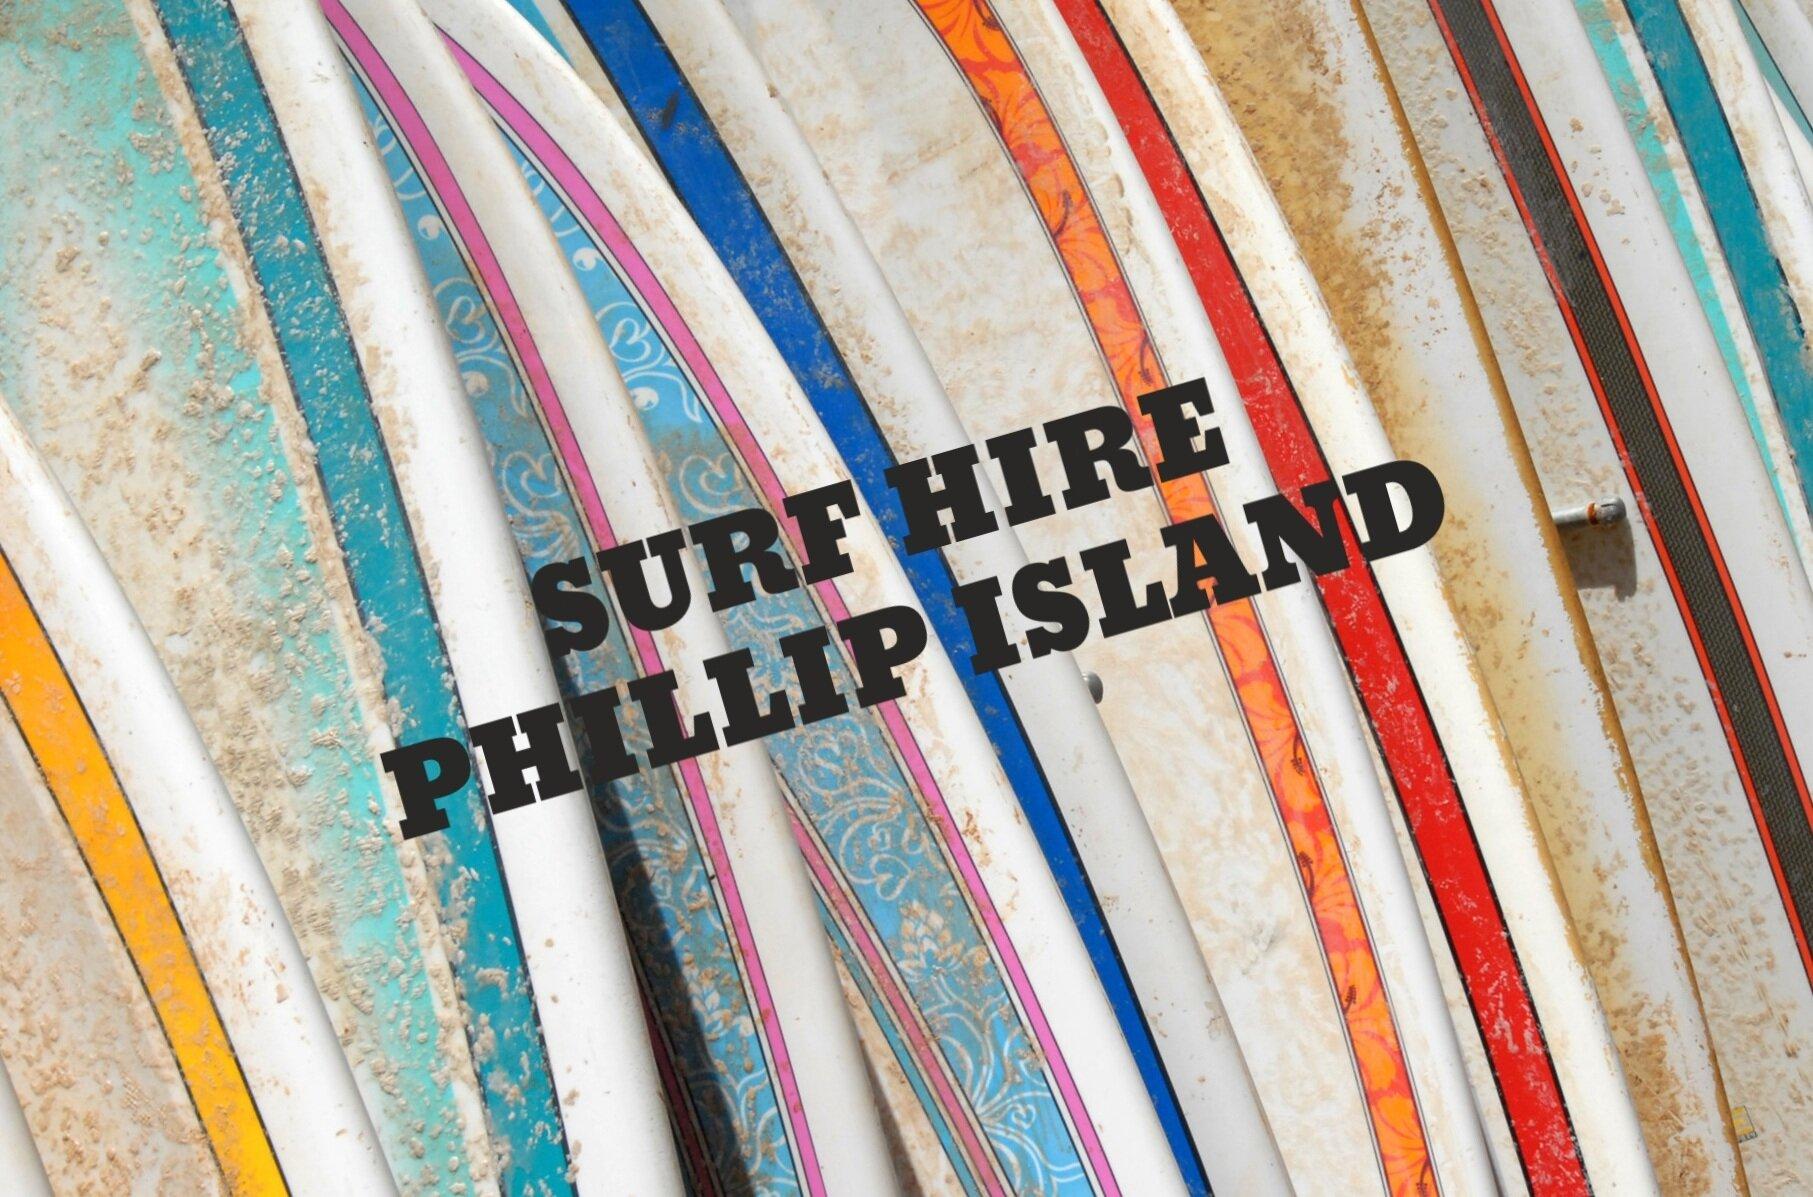 SURF+HIRE+PHILLIP+ISLAND